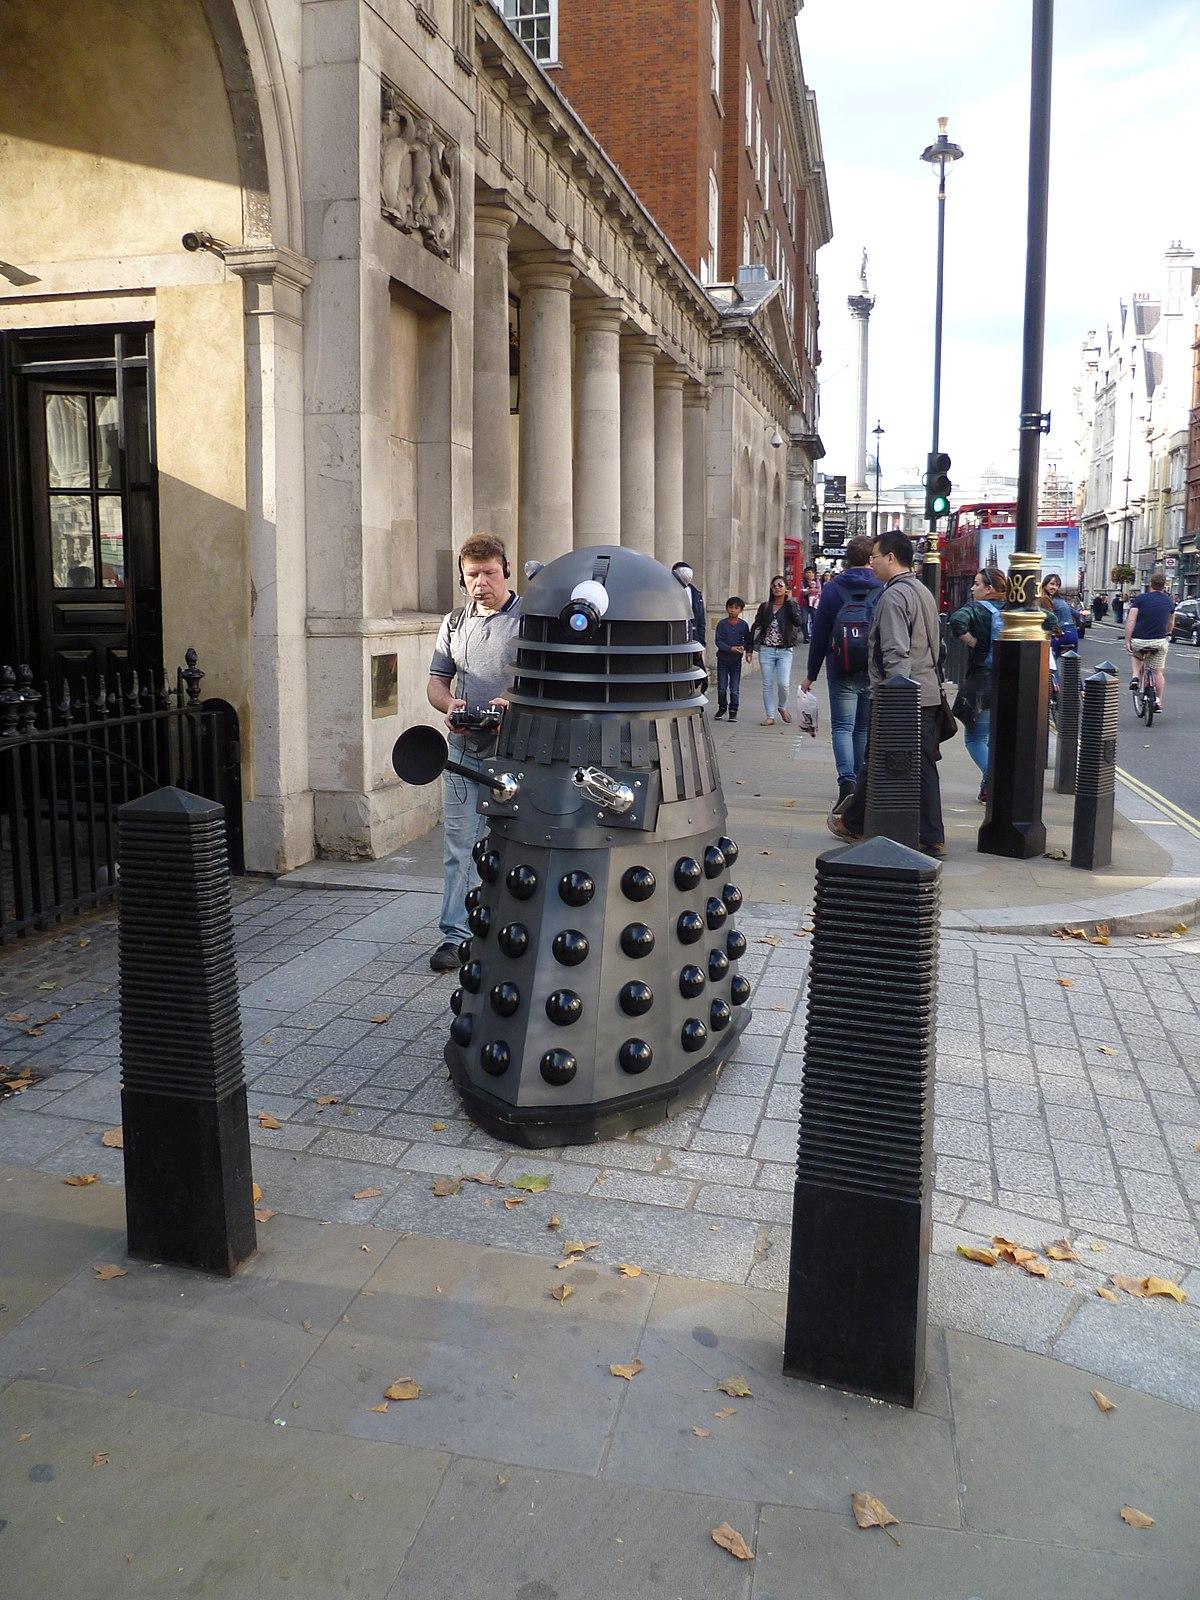 Dalek - Wiktionary